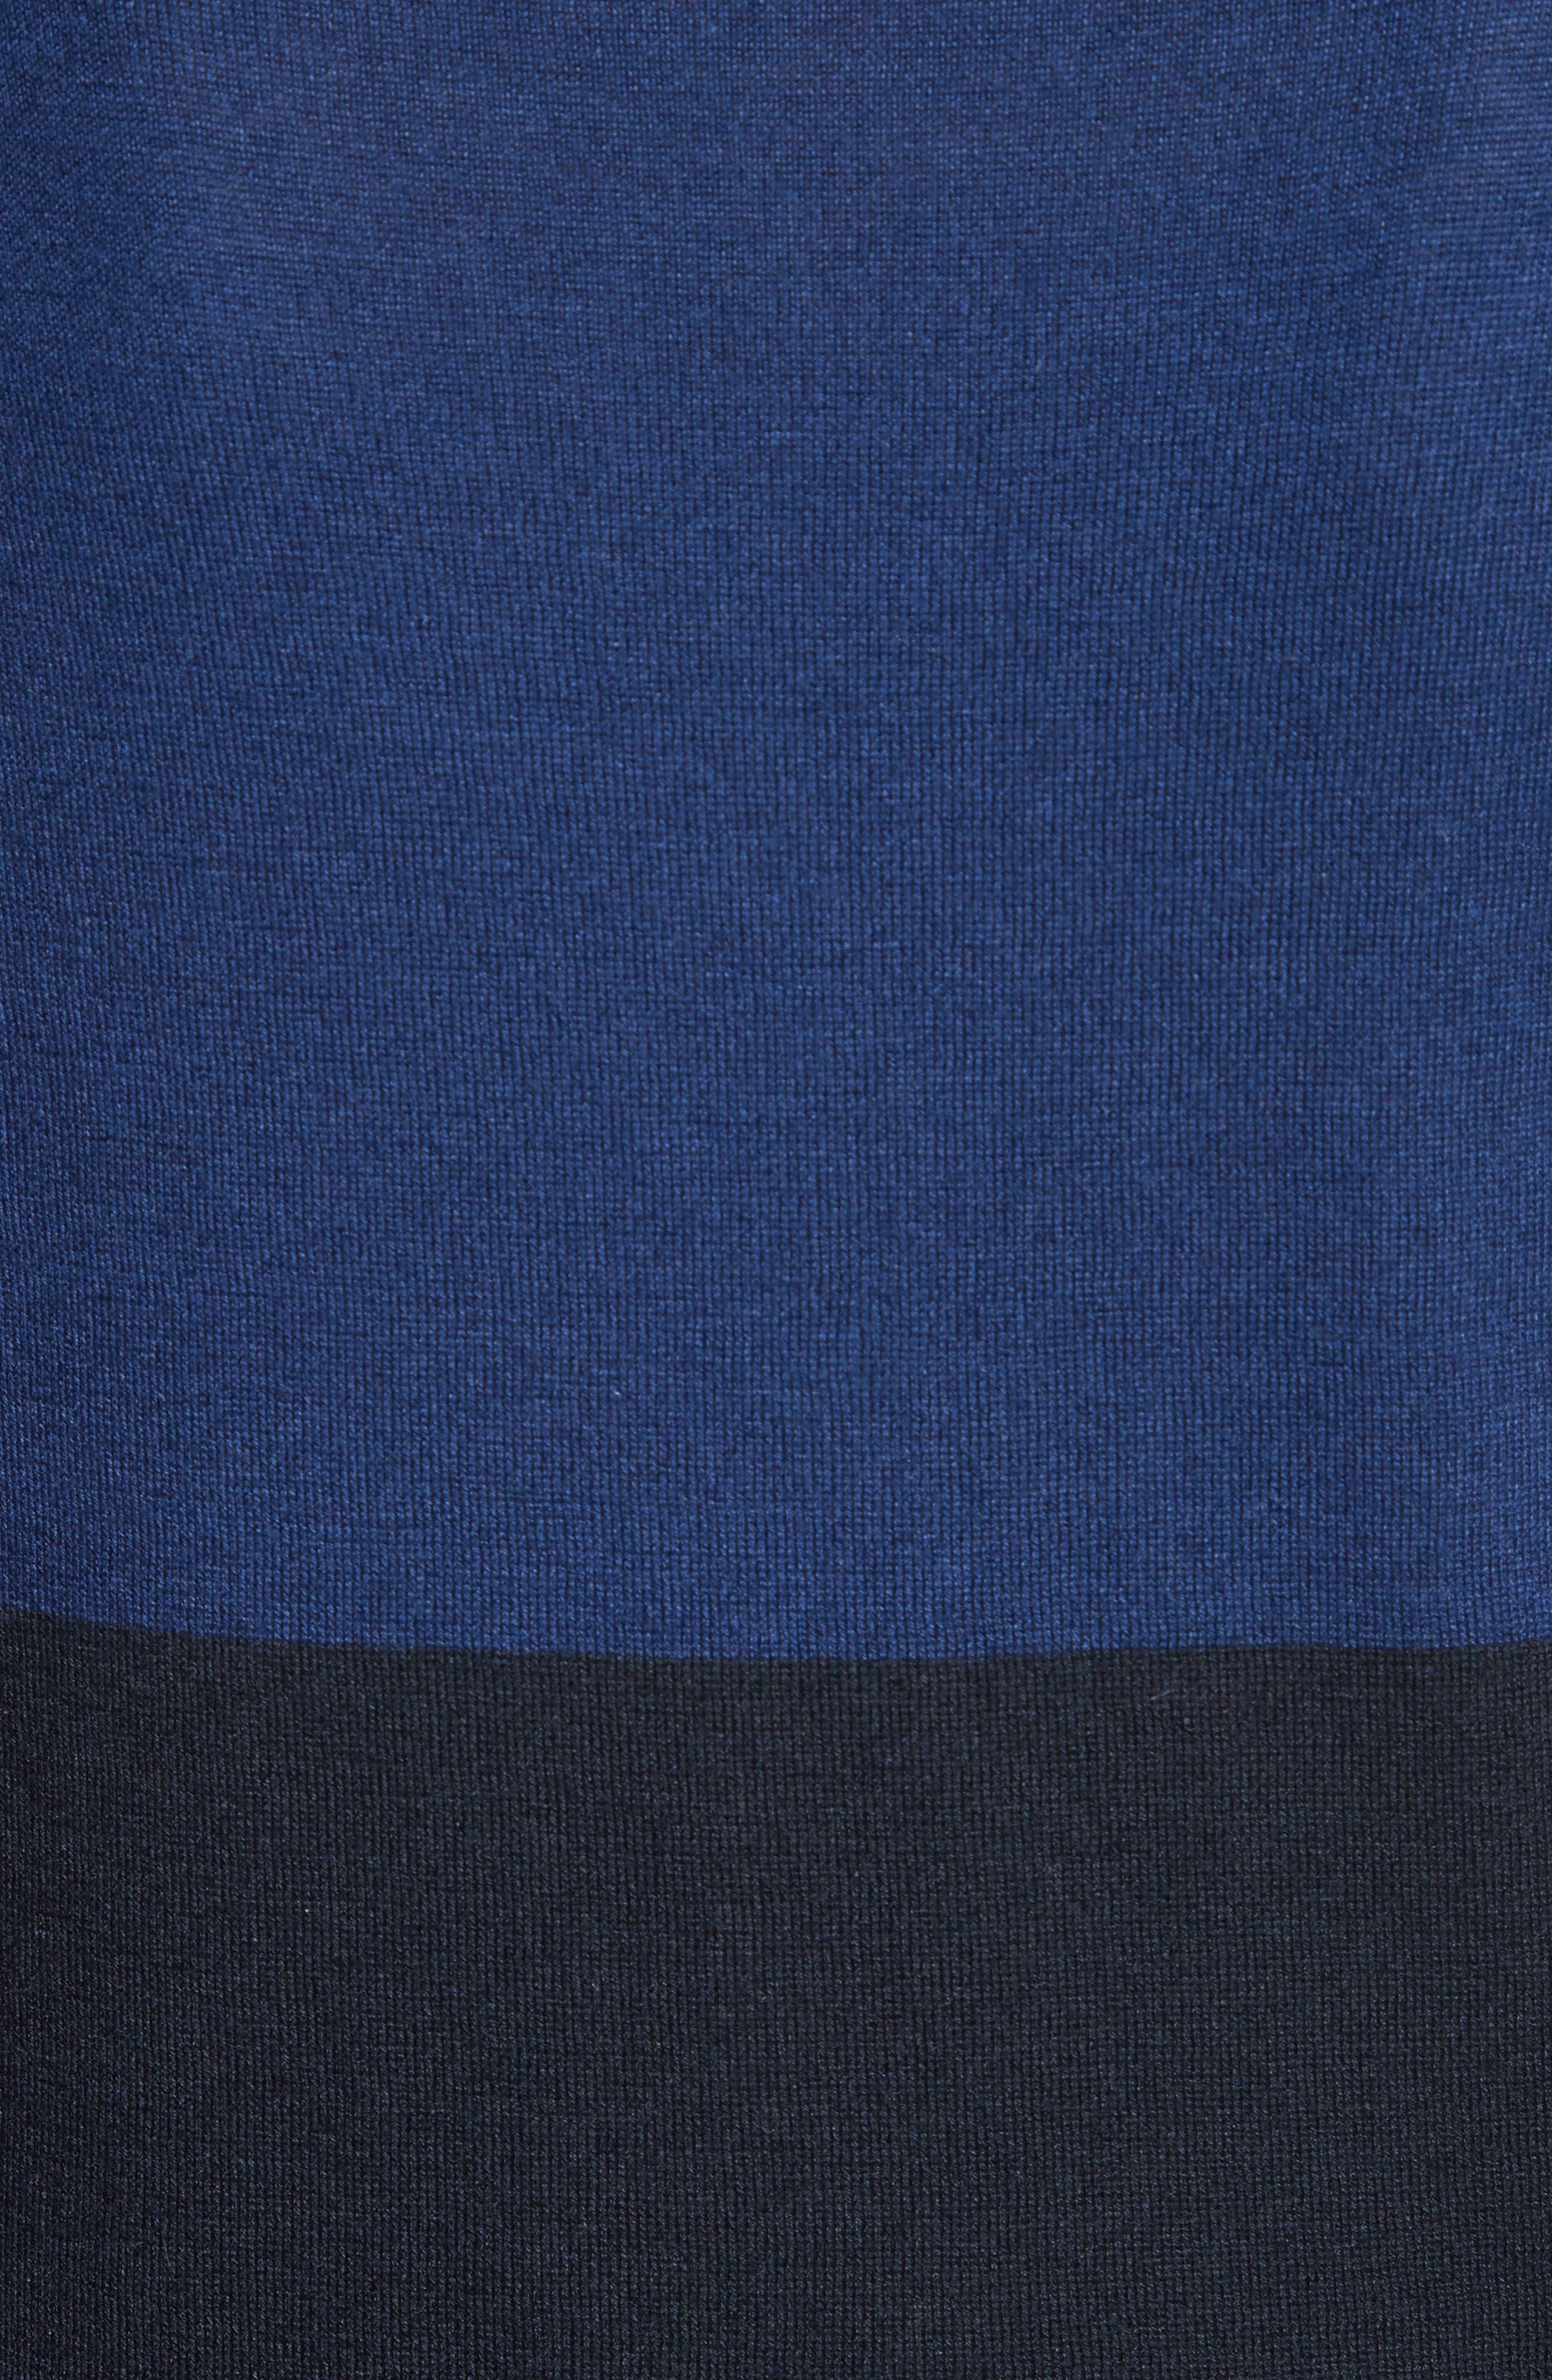 Colimbo Silk & Cashmere Top,                             Alternate thumbnail 3, color,                             Ultra Marine